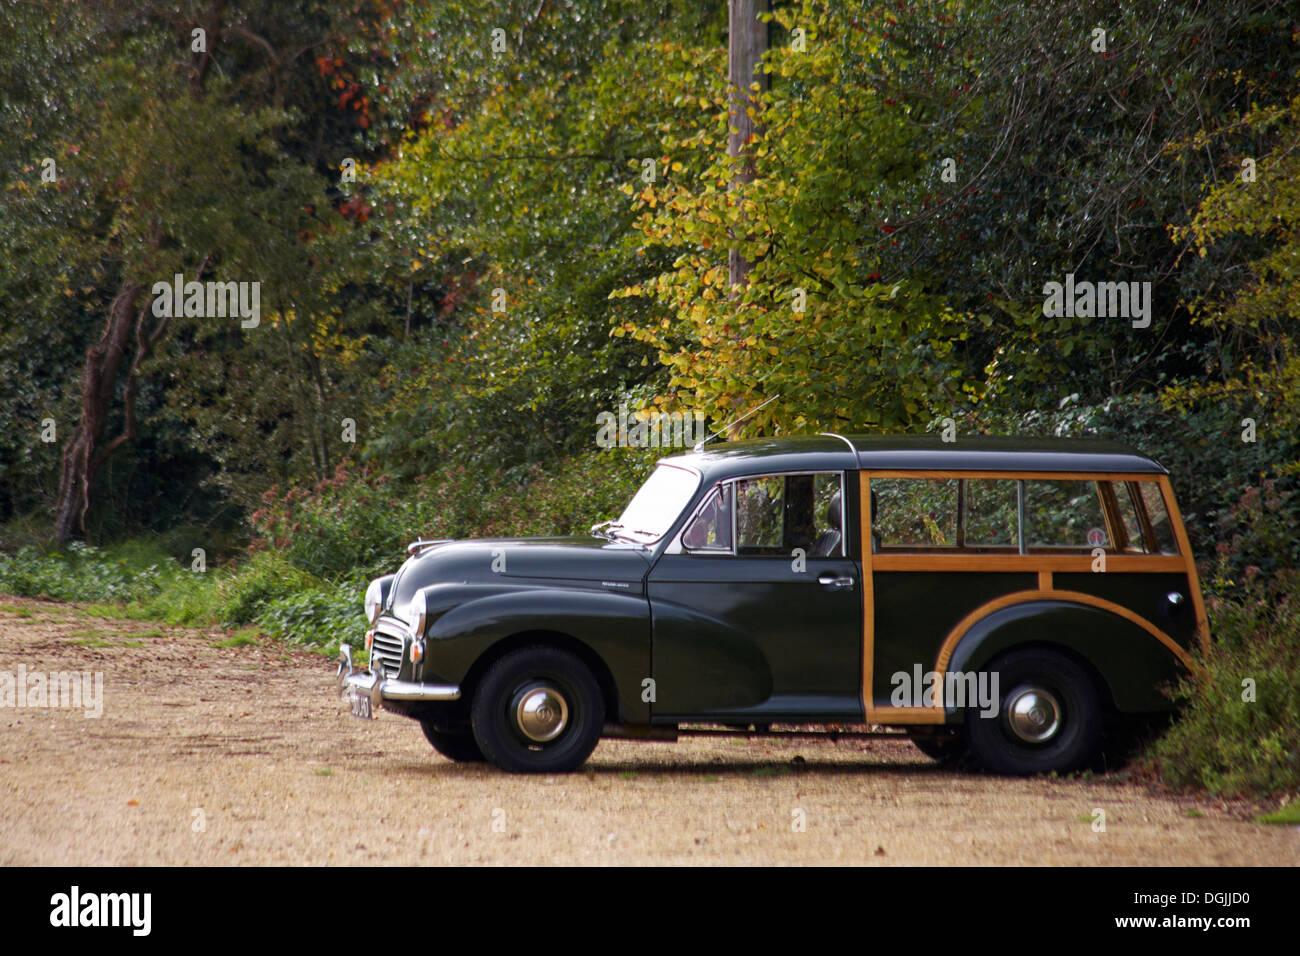 Morris Minor 1000 traveller classic British estate car parked in car park at Buckler's Hard in October - Stock Image